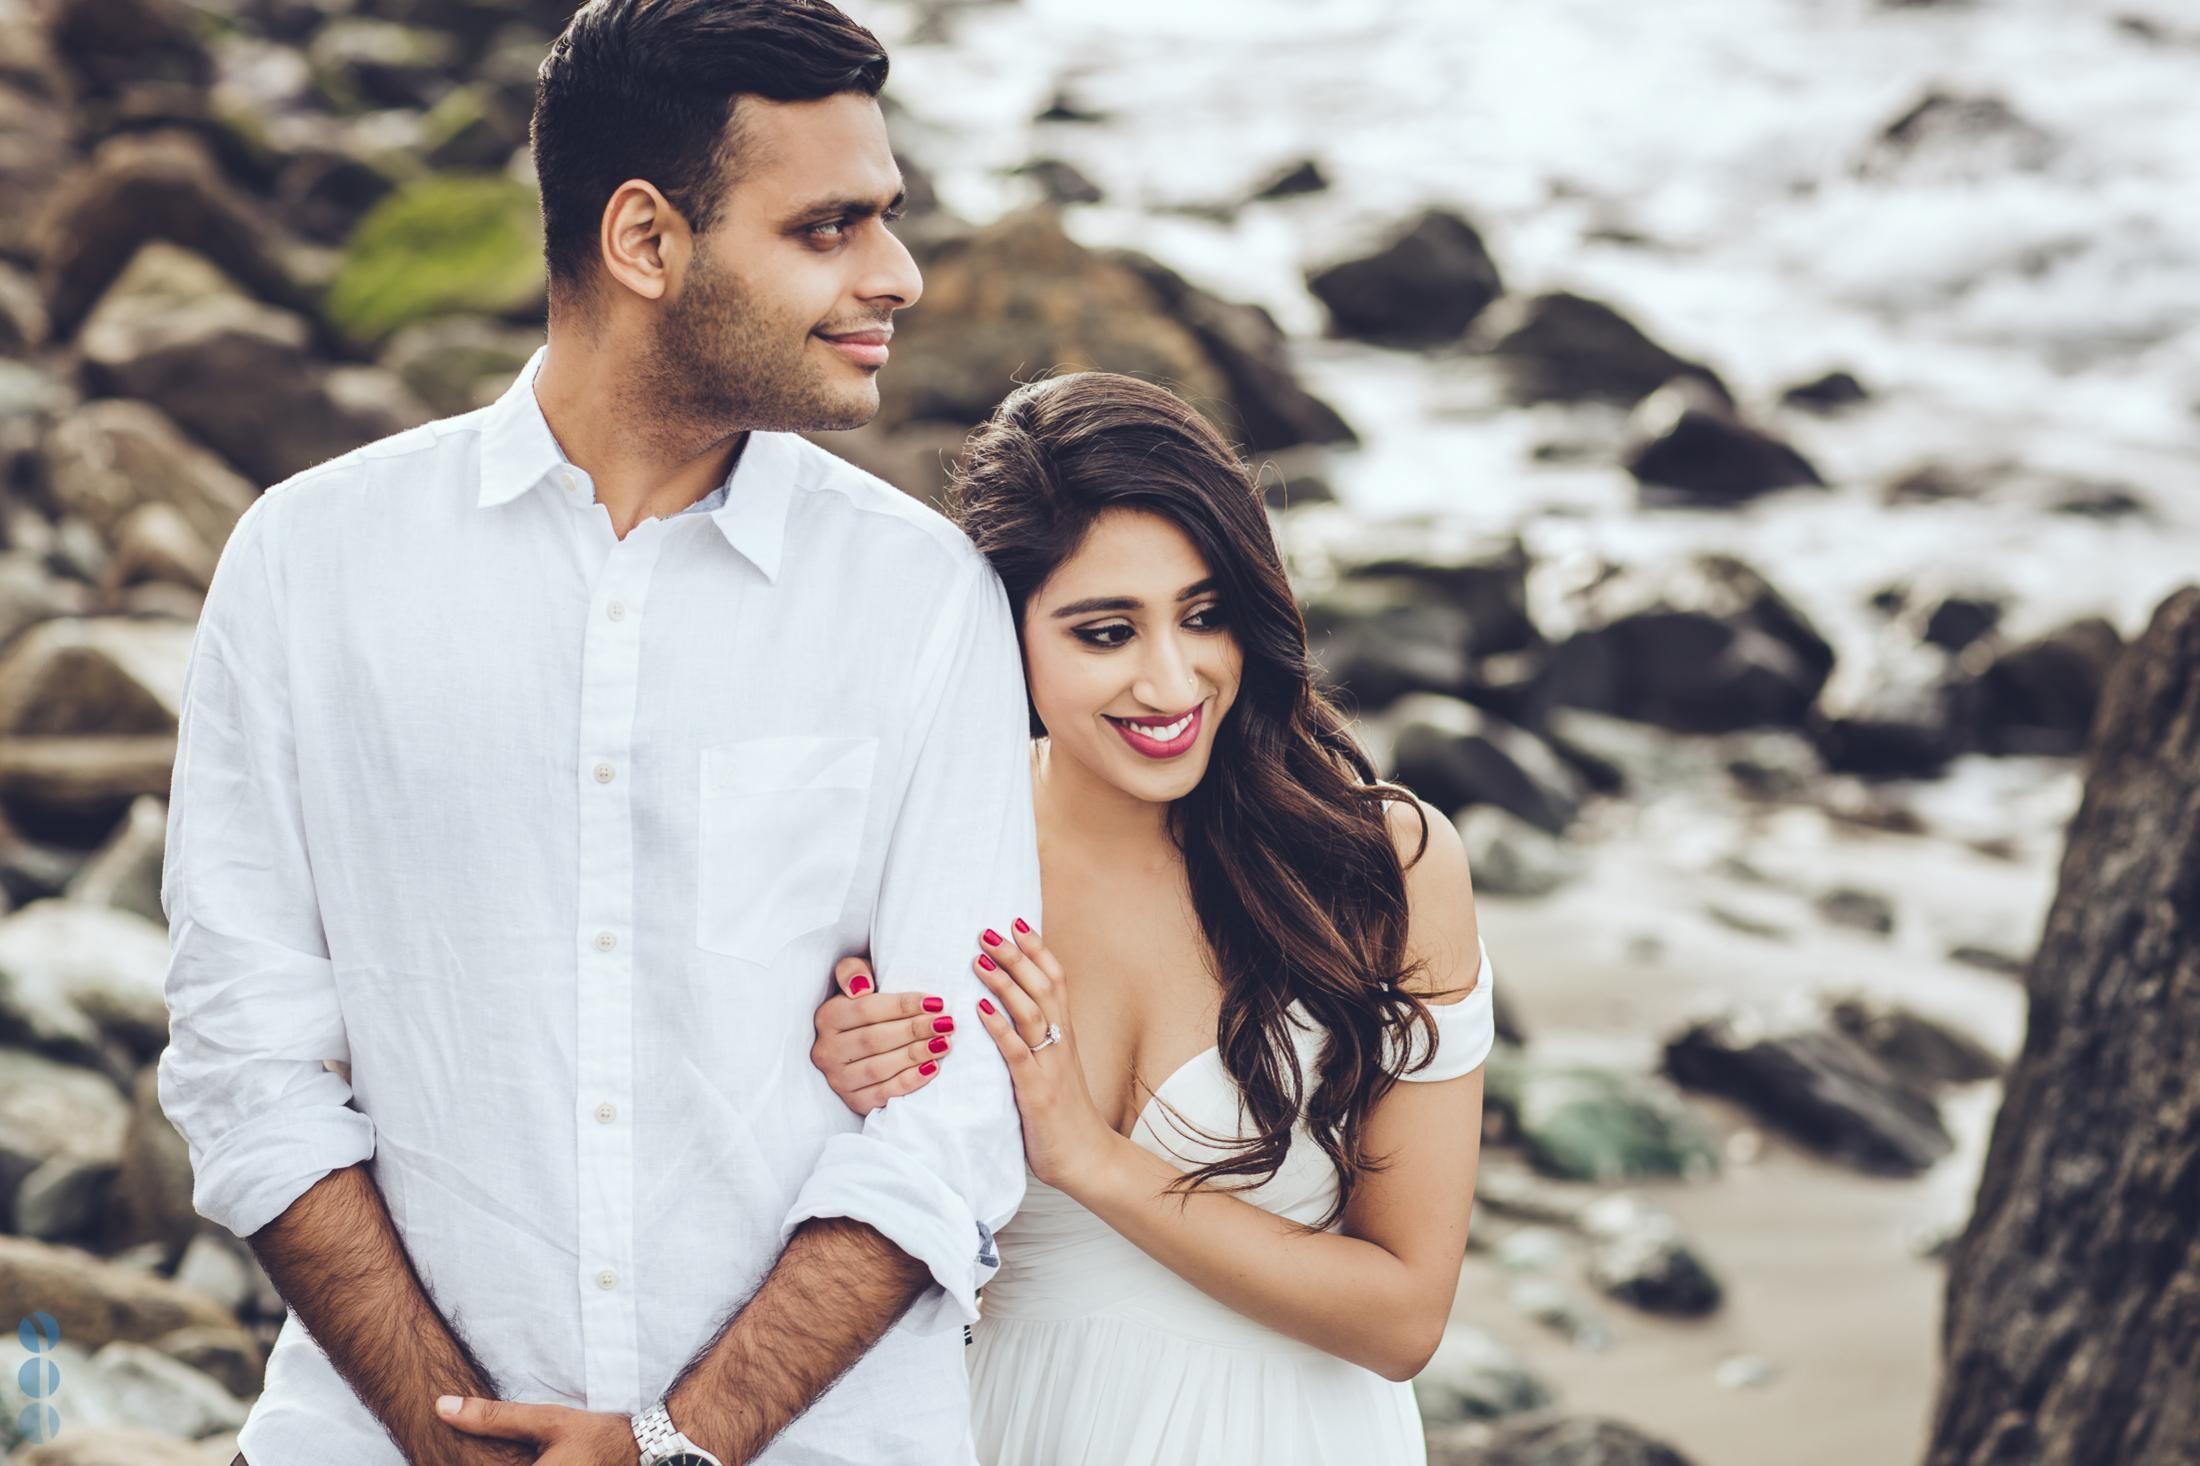 Indian dating San Francisco gratis dating sites in Kaapstad